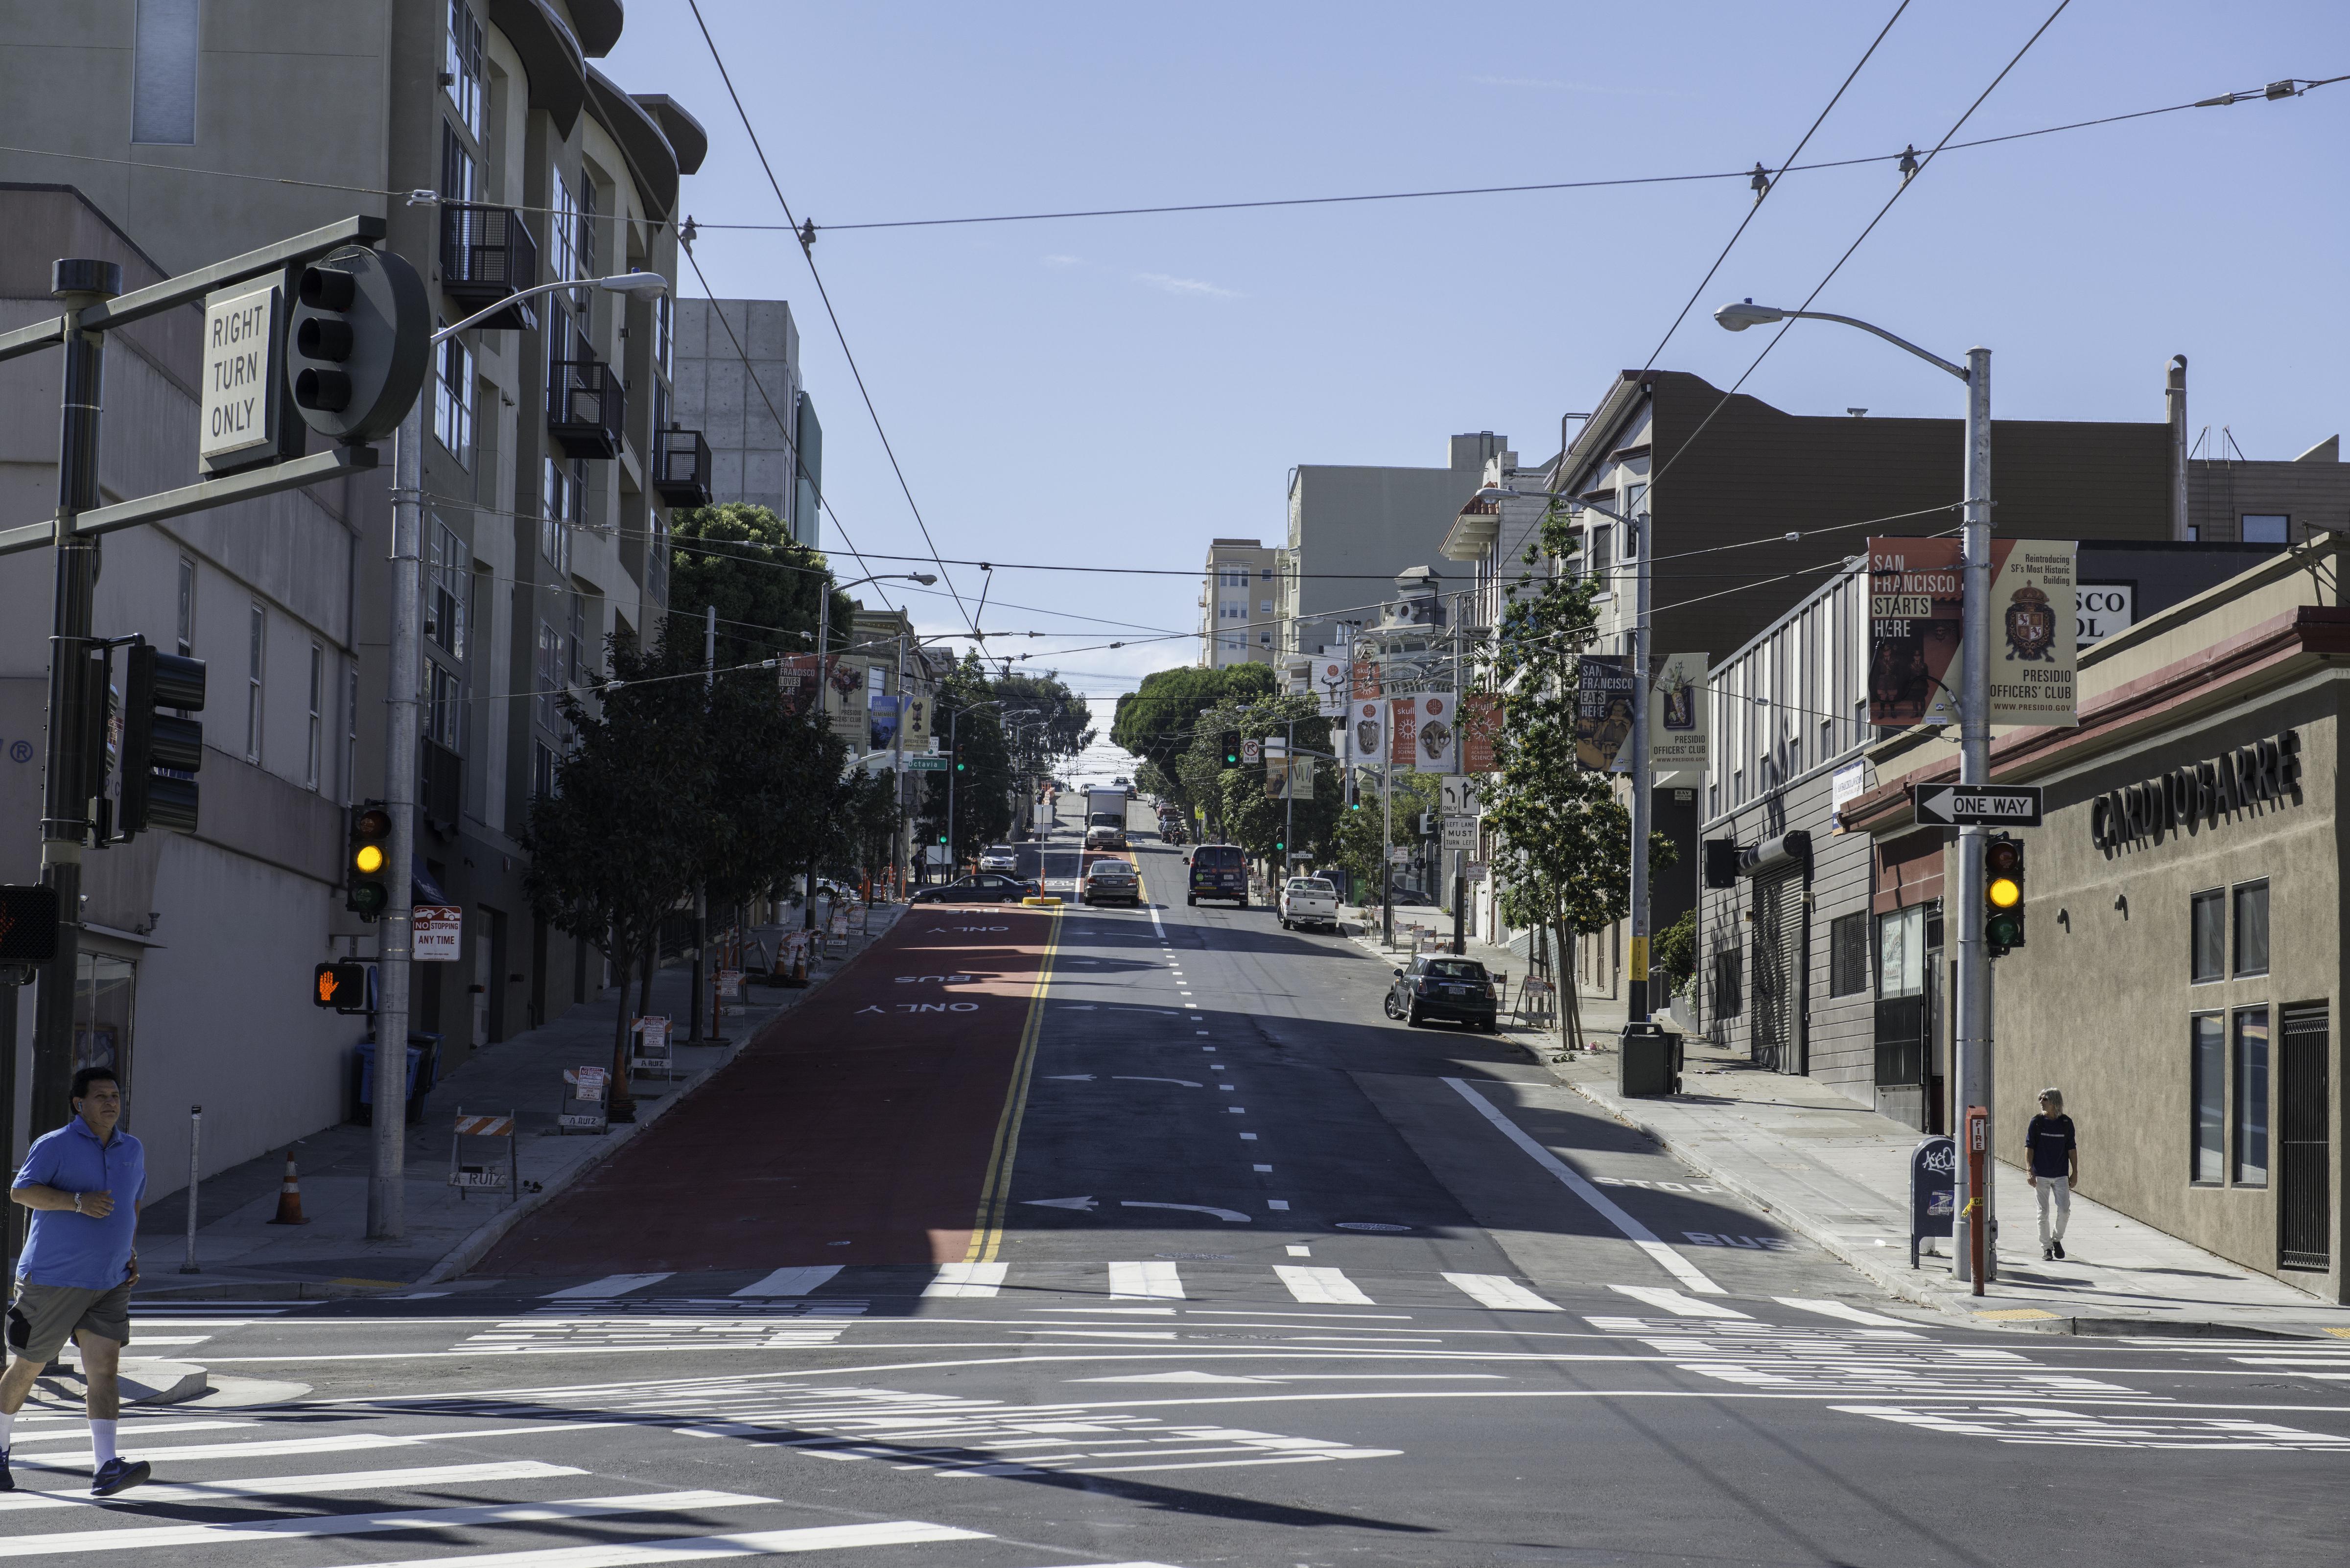 Haight Street, San Francisco (credit: SFMTA)